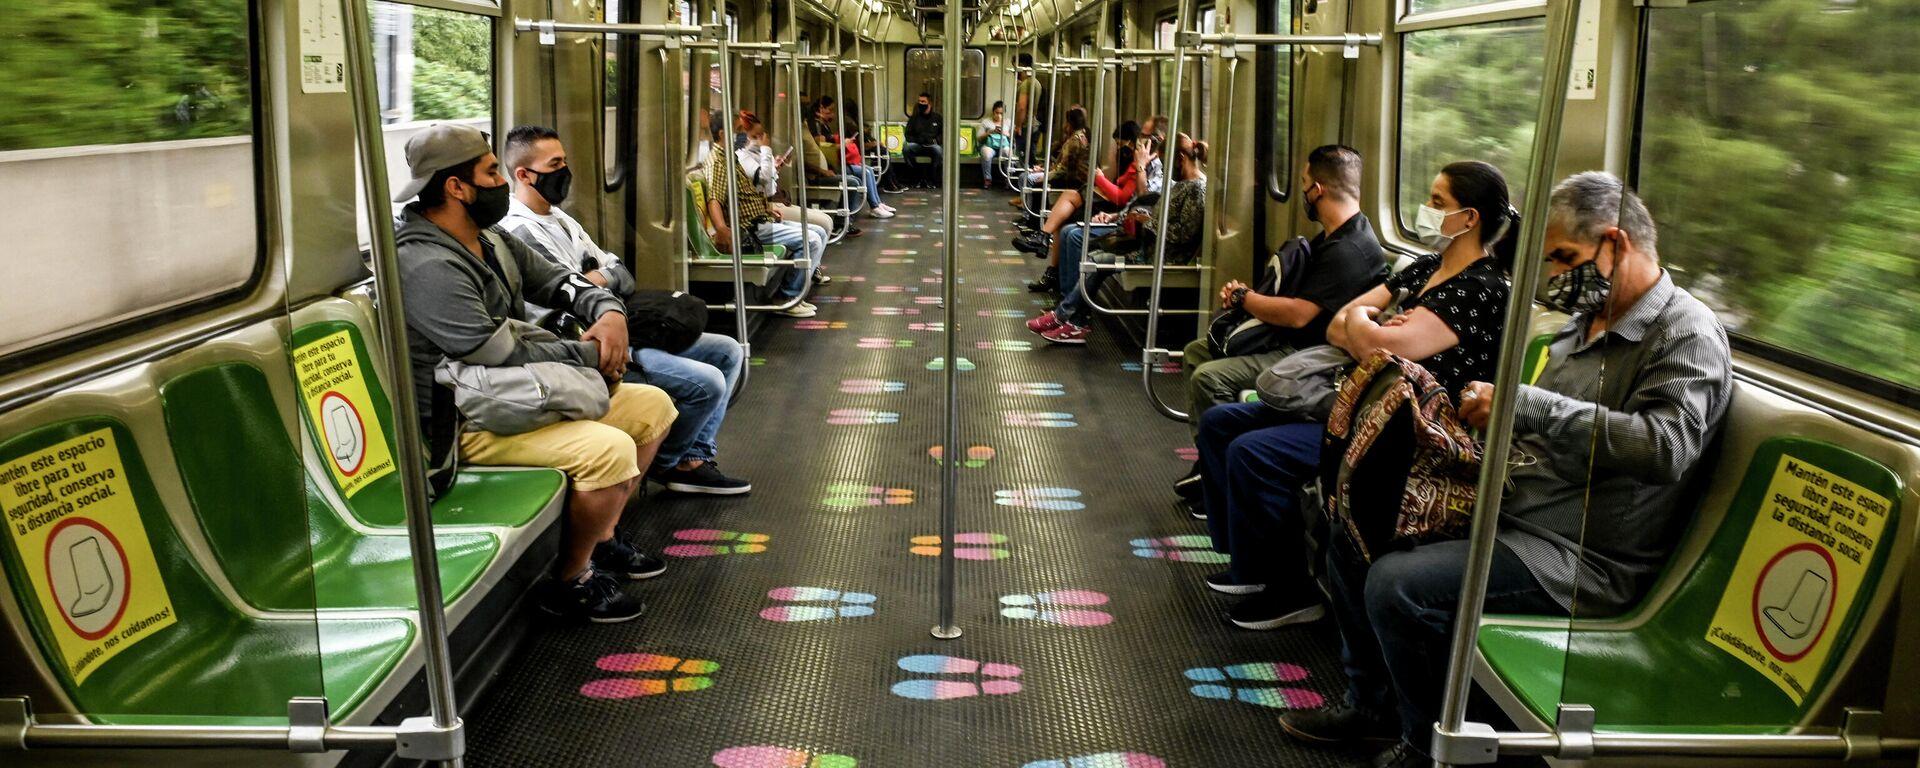 Metro de Medellín, Colombia - Sputnik Mundo, 1920, 03.06.2021